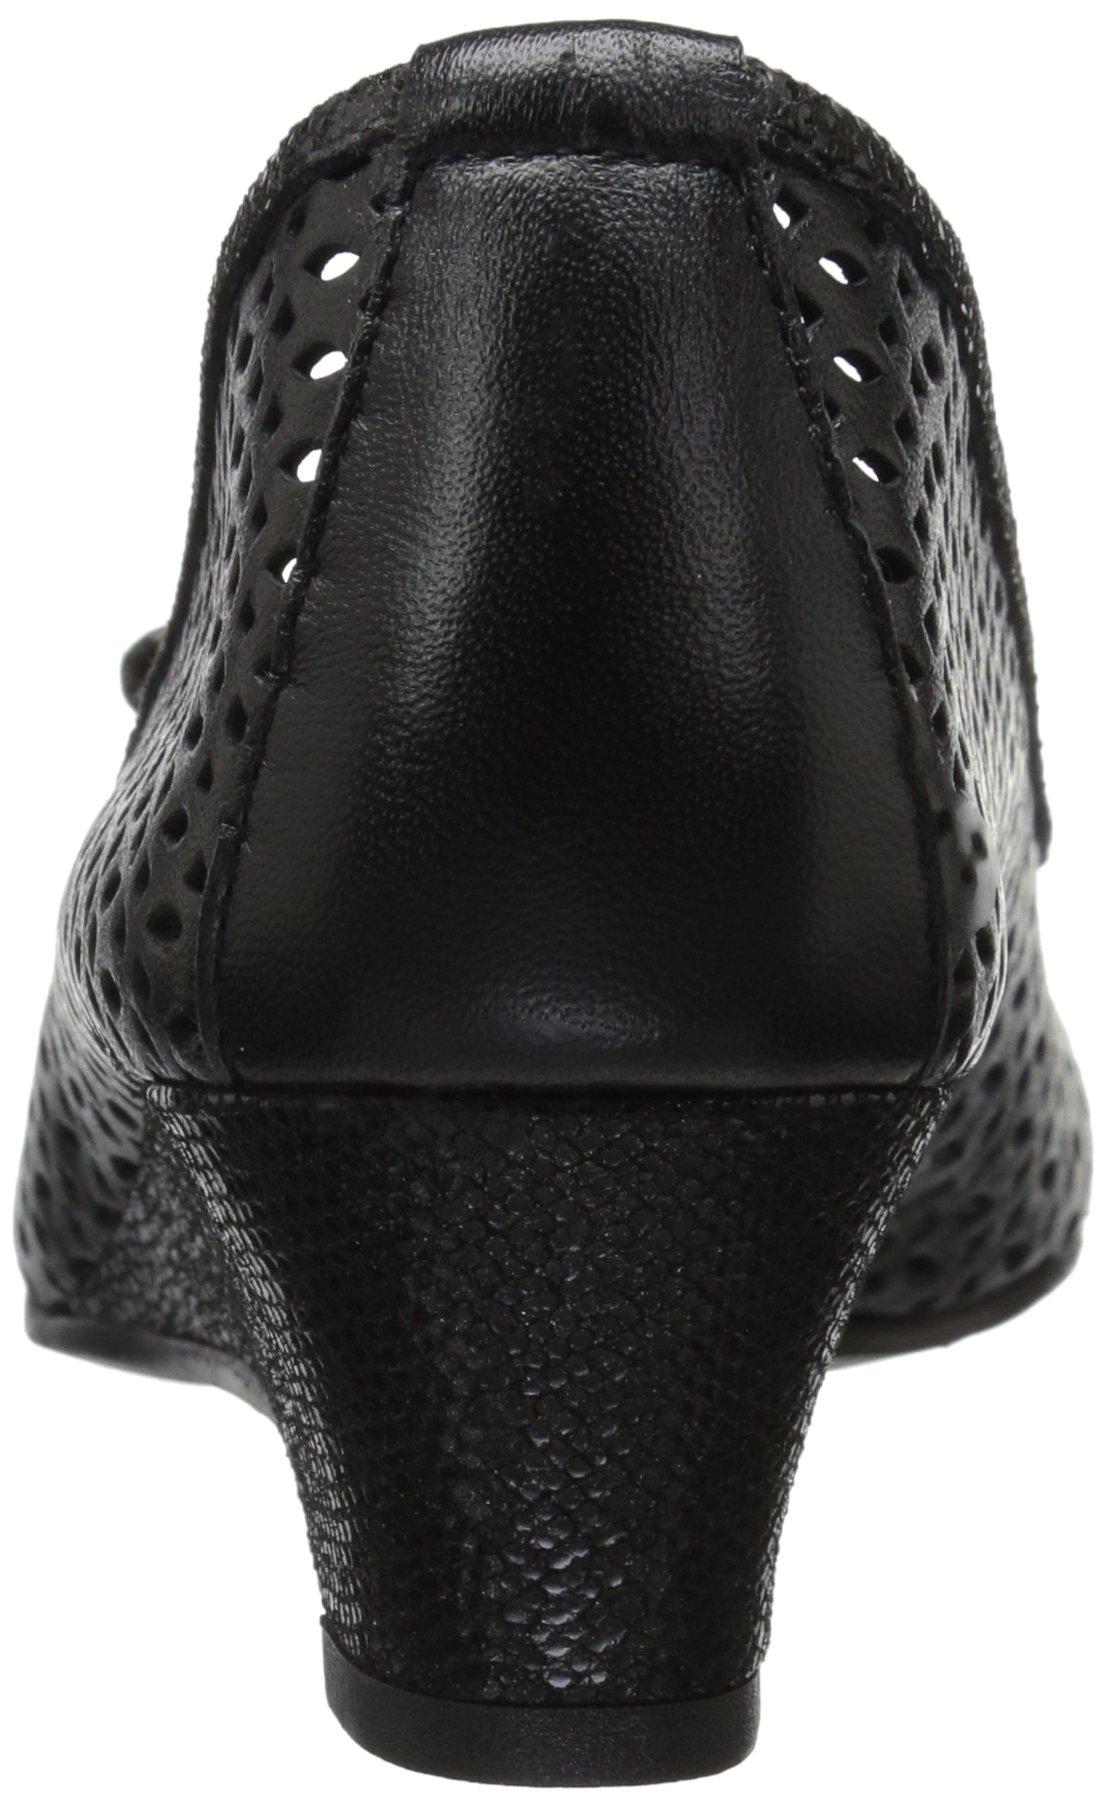 VANELi Women's Brinly Wedge Sandal, Black Perfed Nappa/Black Summer VIP, 9.5 N US by VANELi (Image #2)